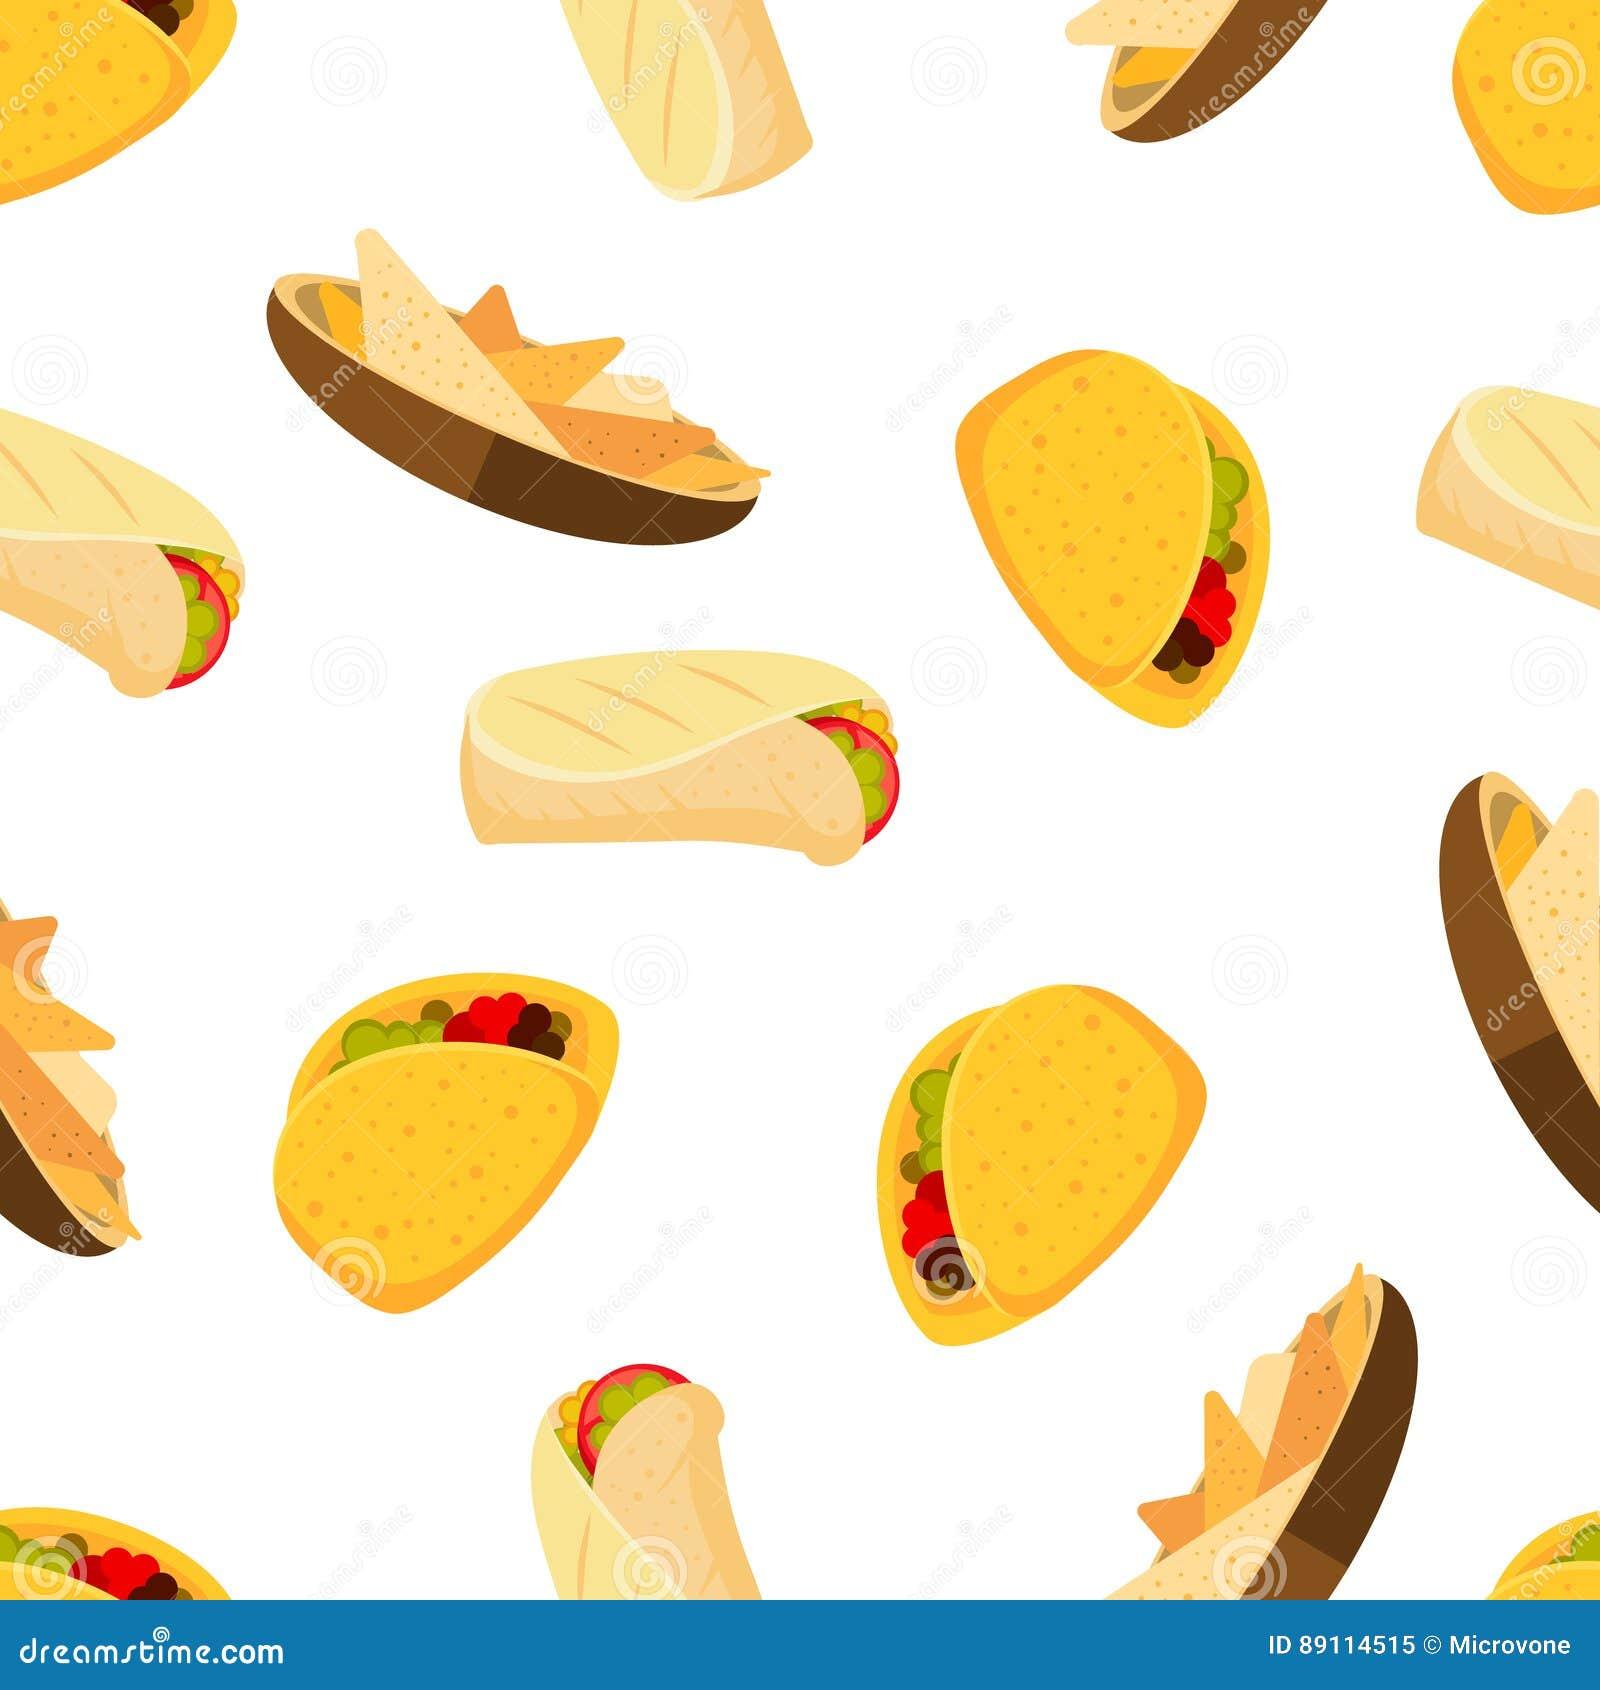 taco pattern wallpaper